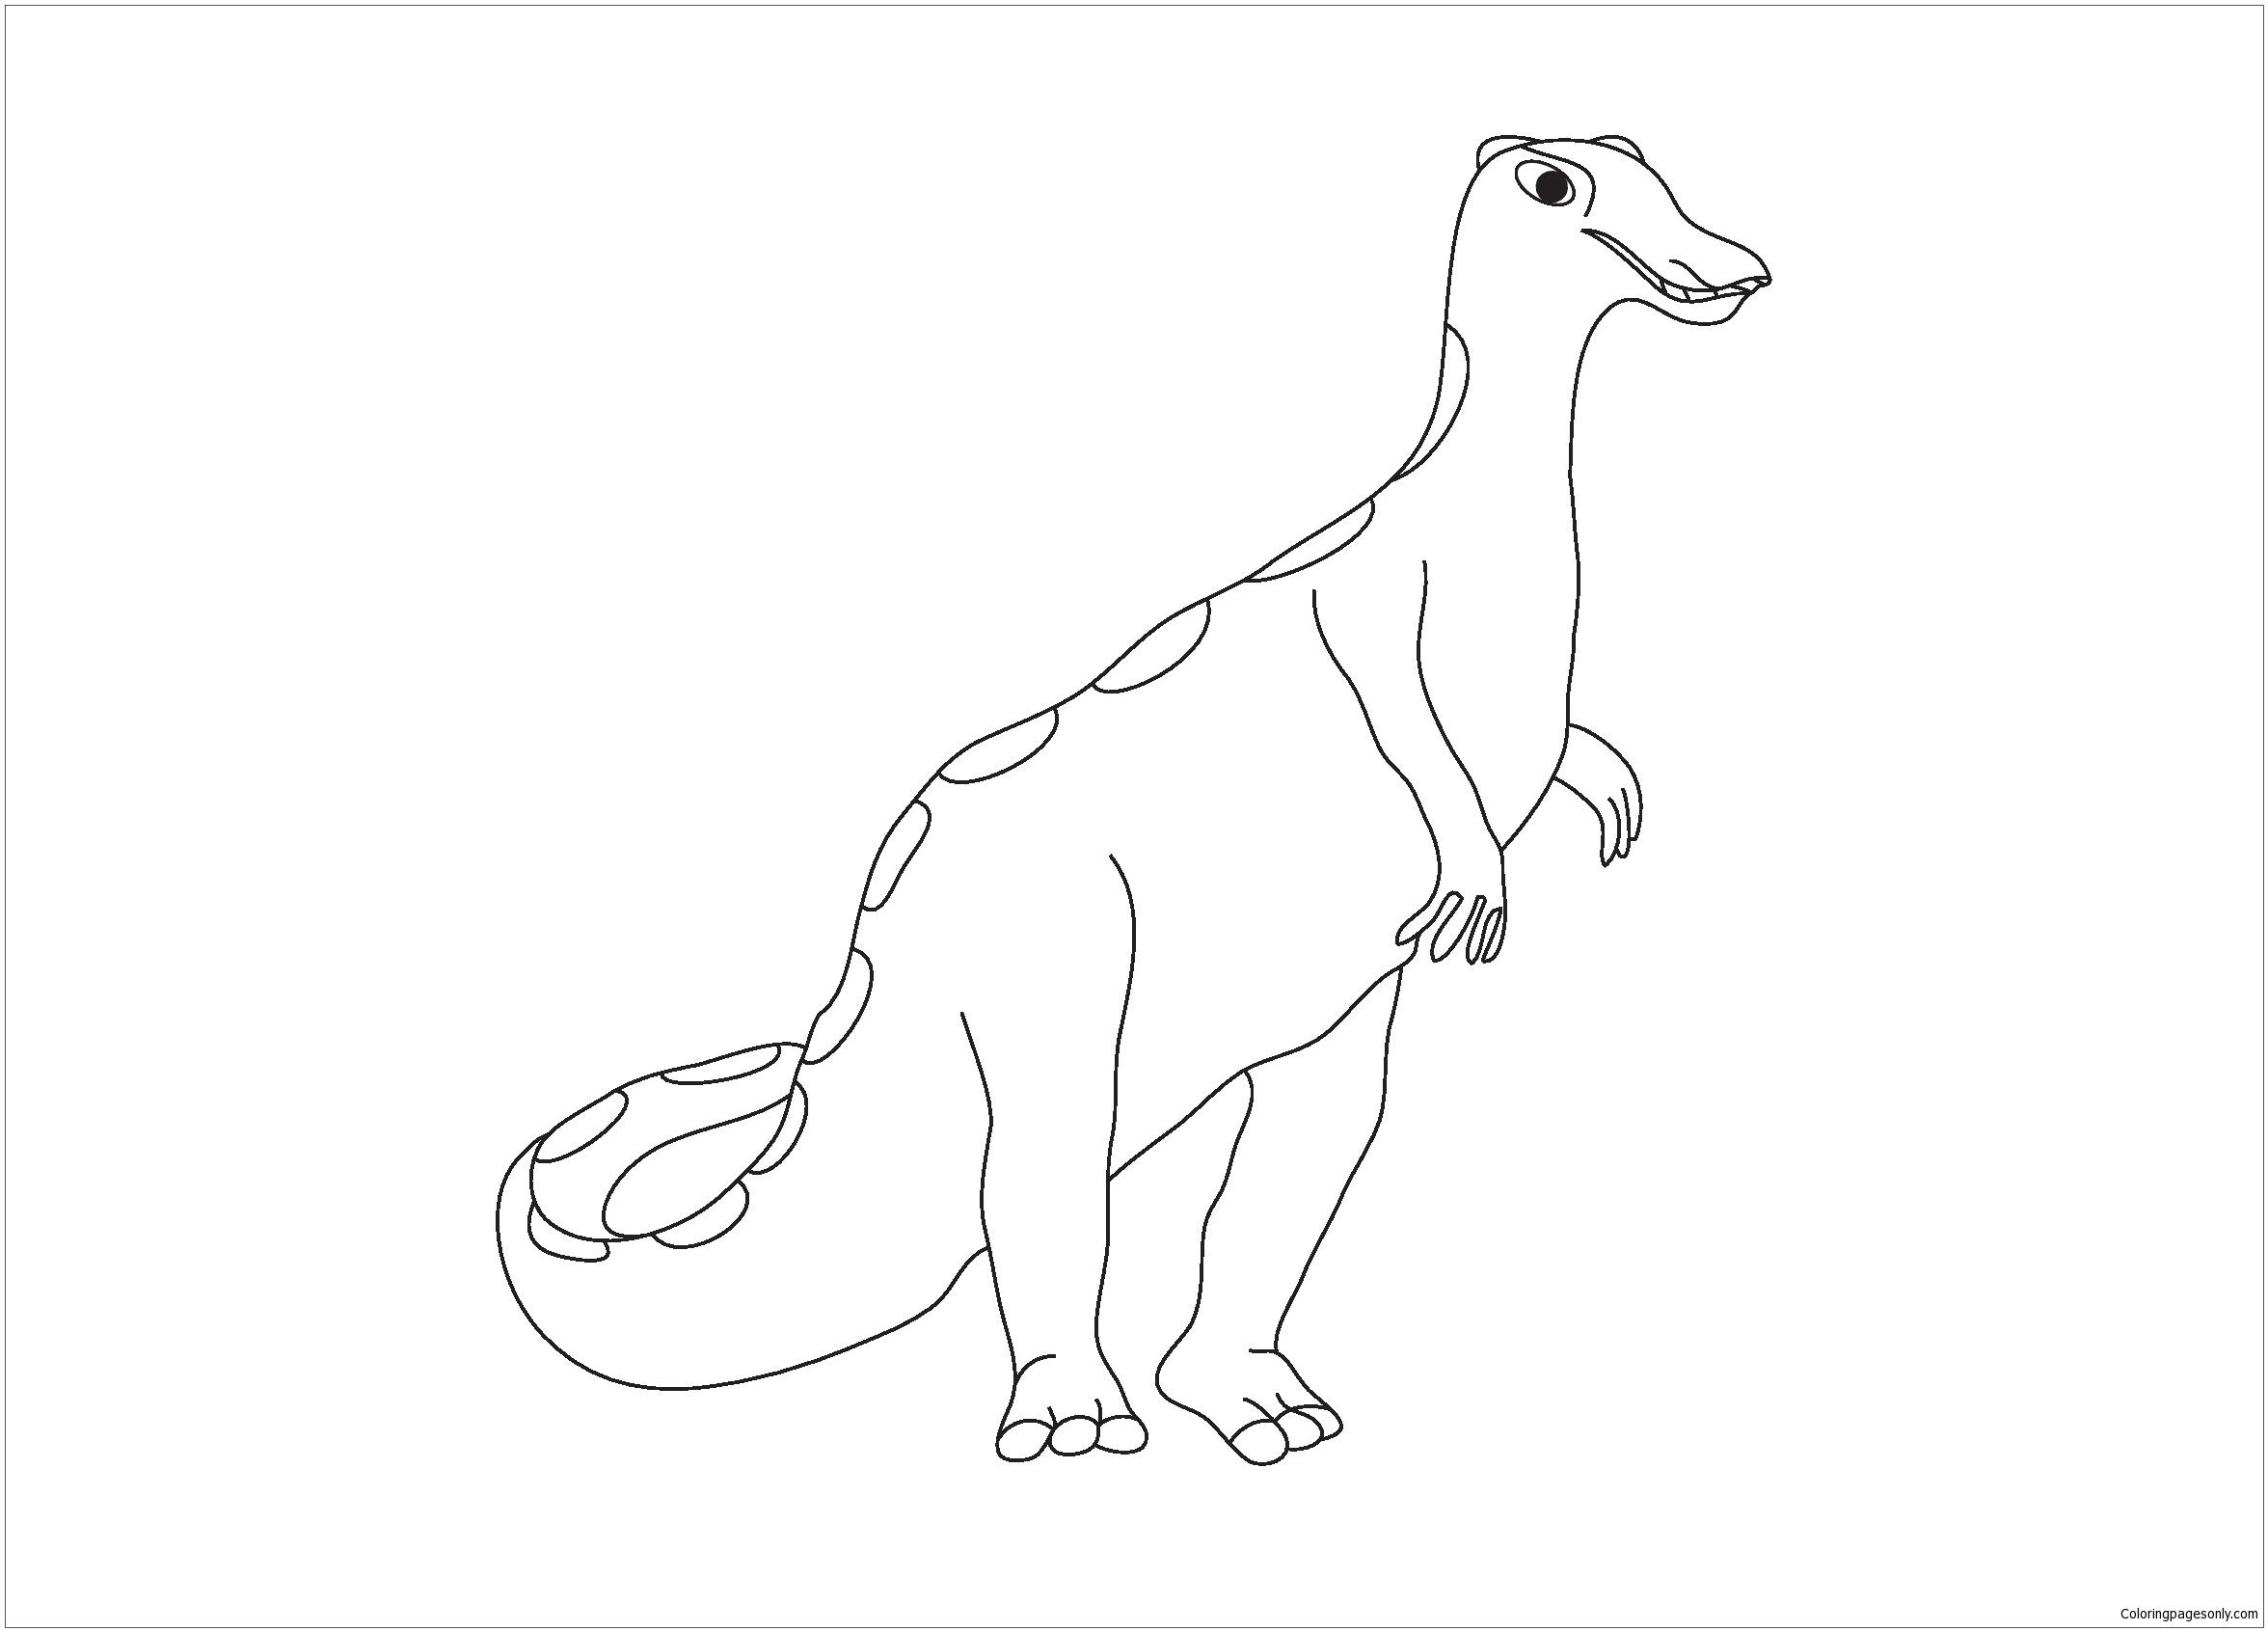 Camptosaurus Dinosaur Coloring Page